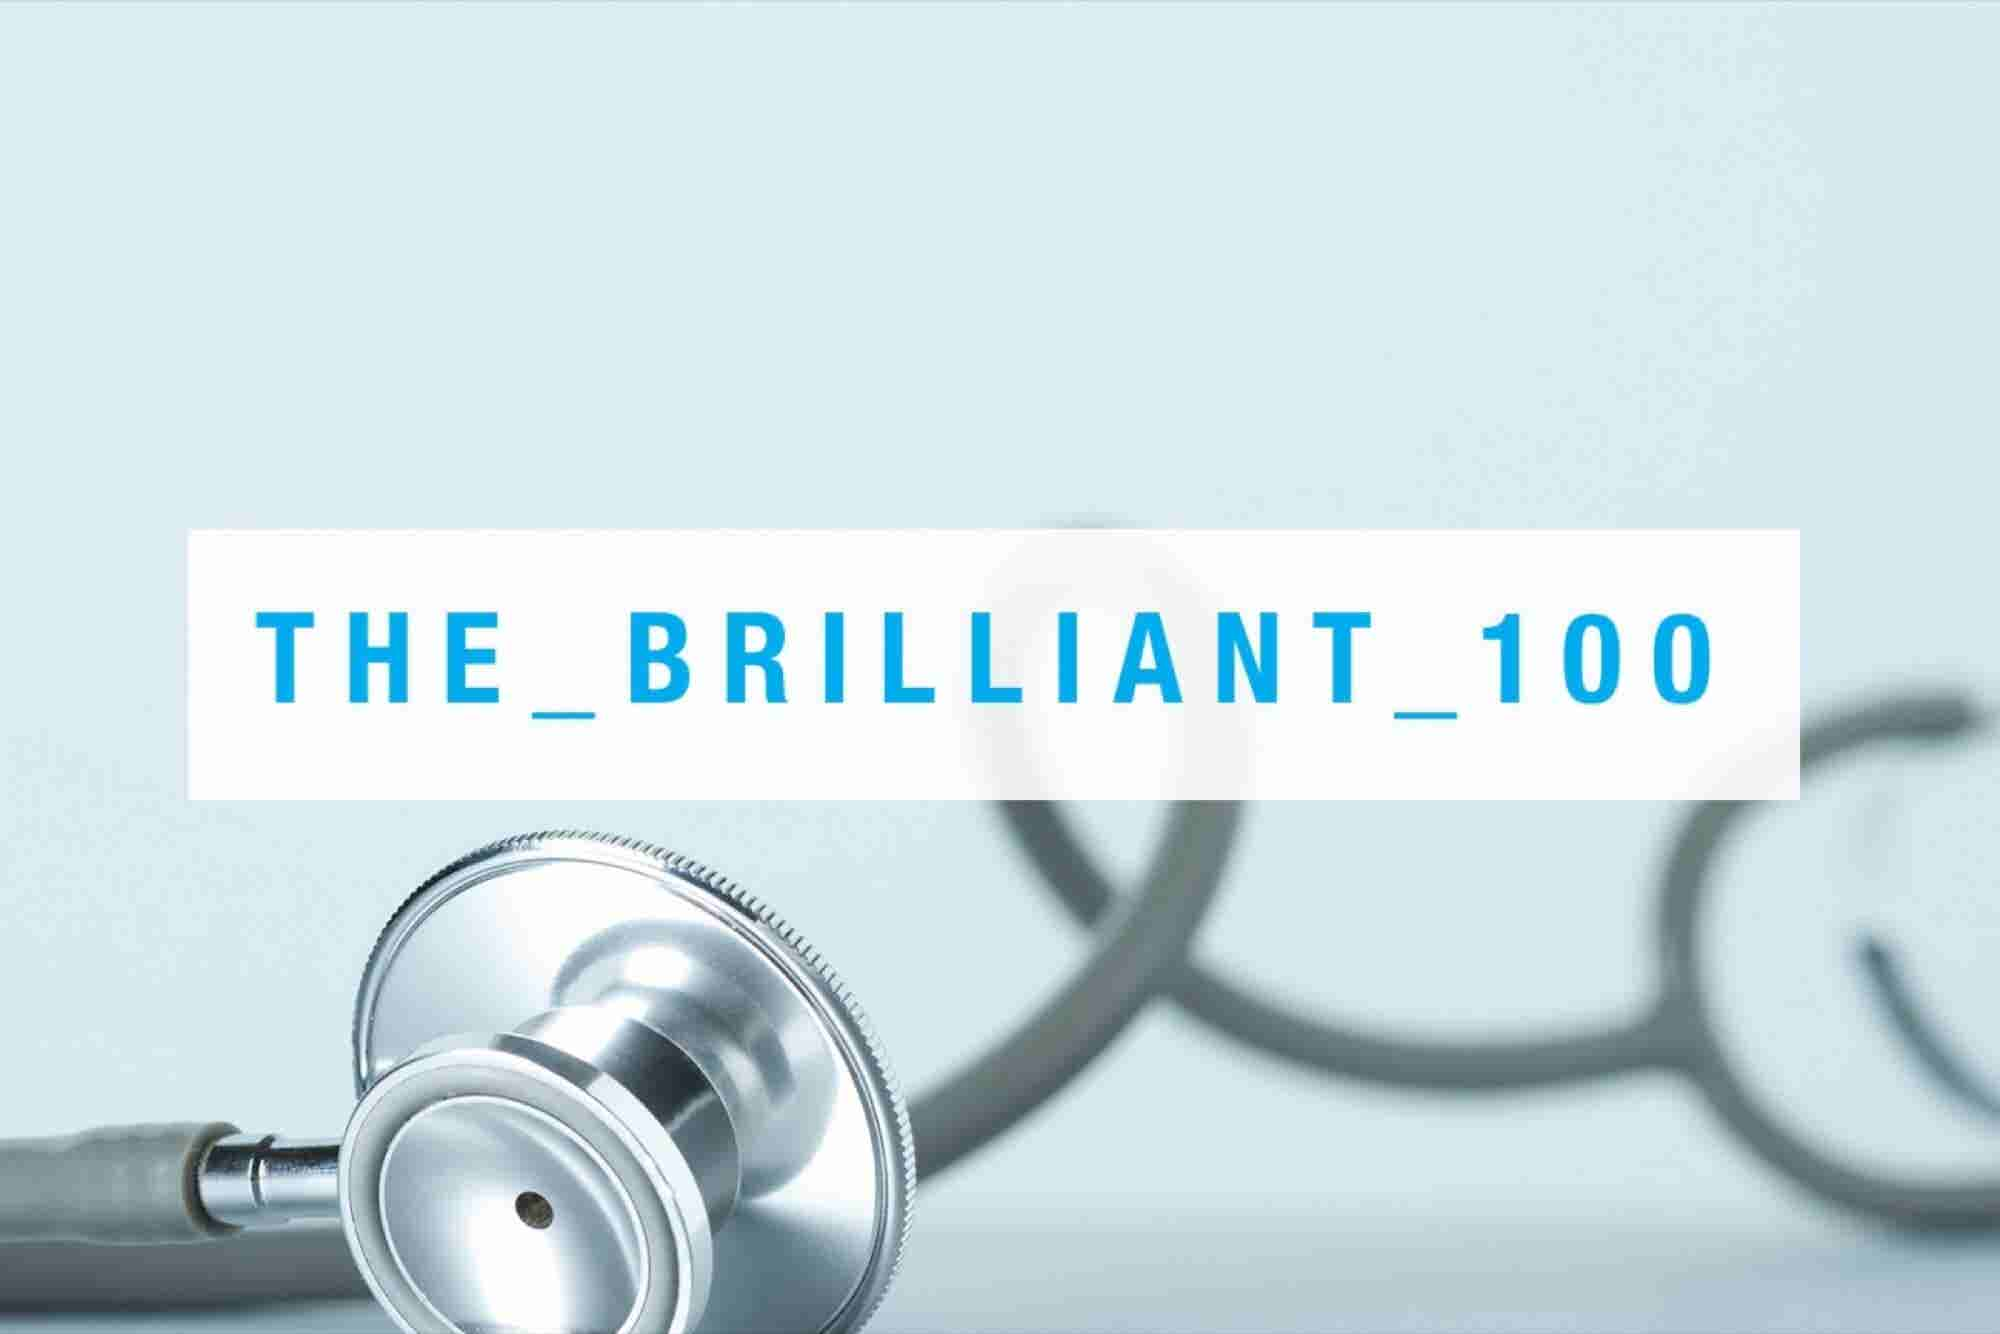 10 Health Companies to Watch - Entrepreneur's Brilliant 100